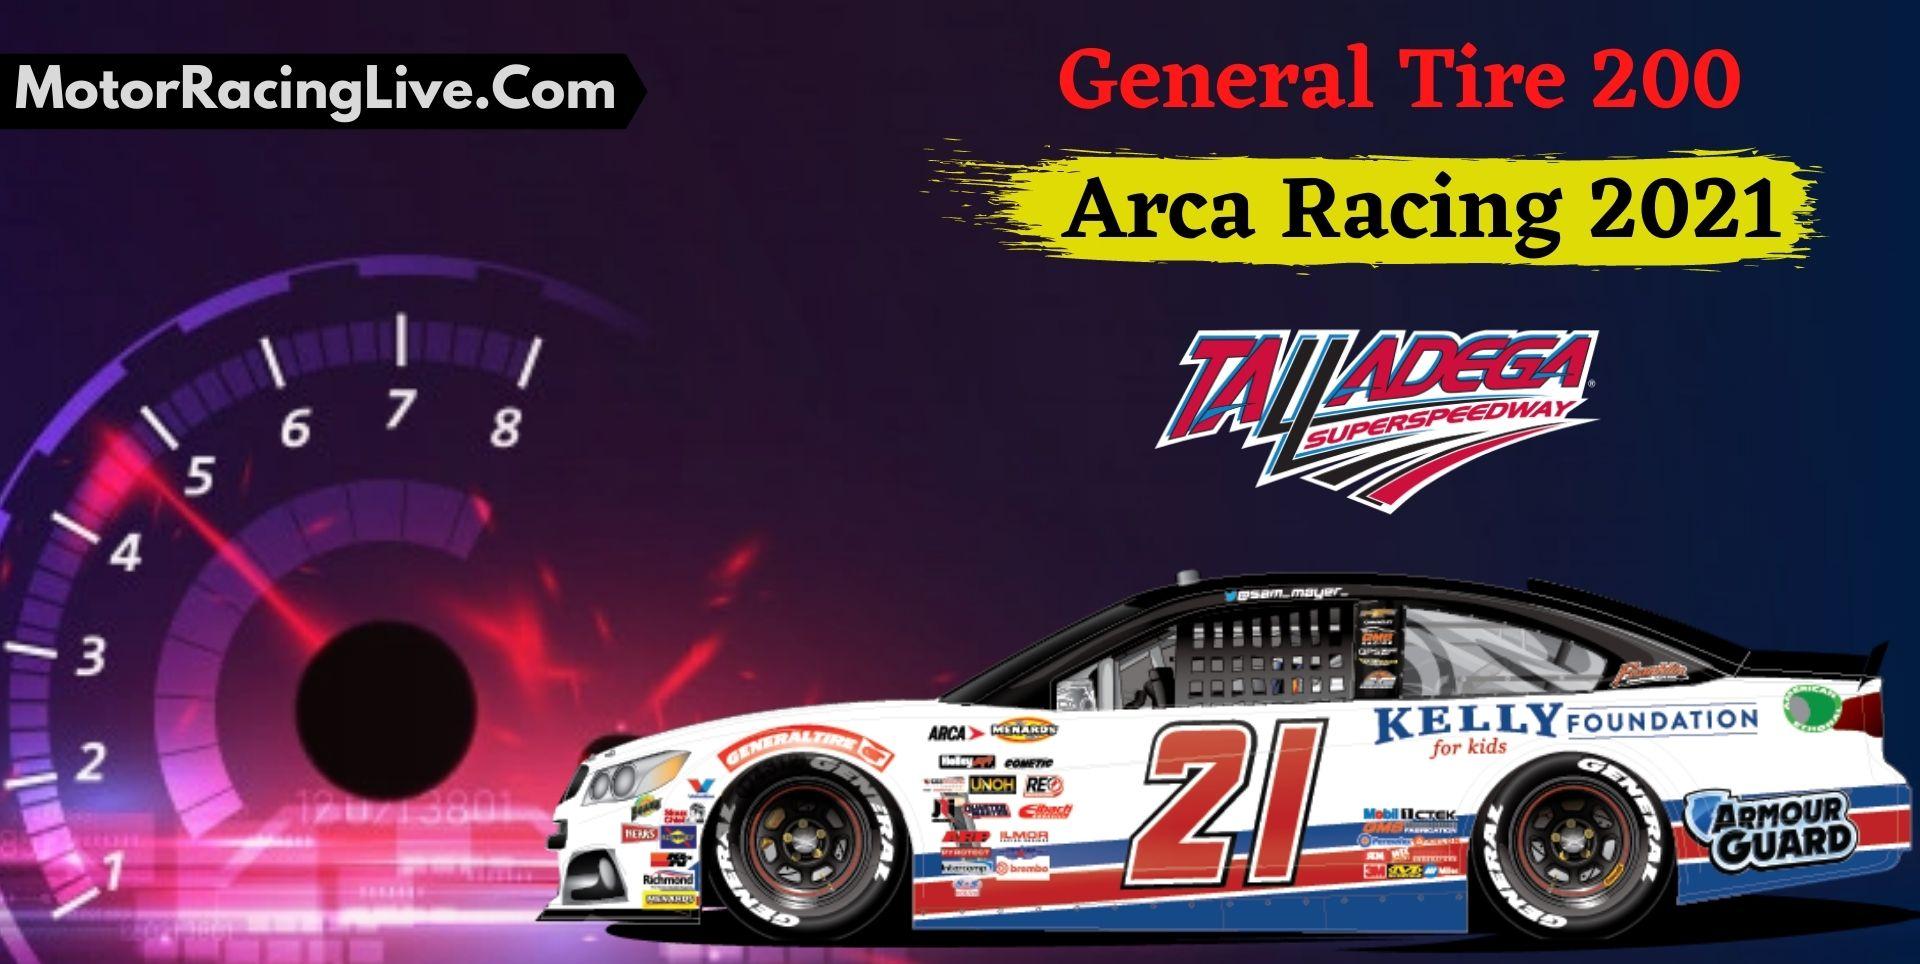 General Tire 200 Live Stream ARCA Racing 2021